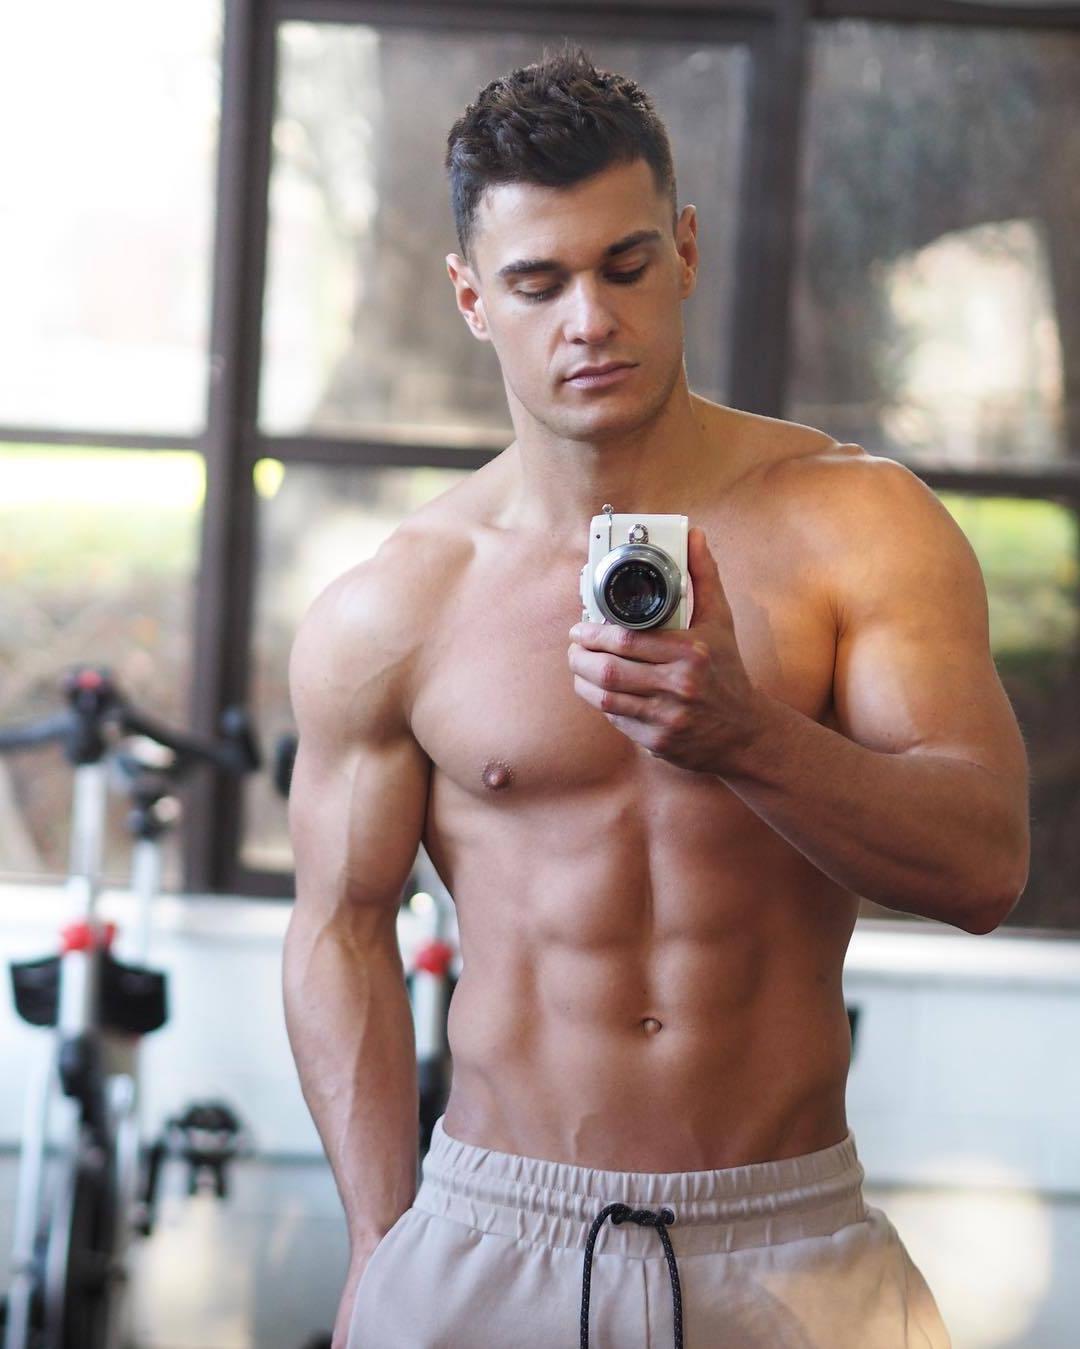 hot-guys-selfies-shirtless-fit-body